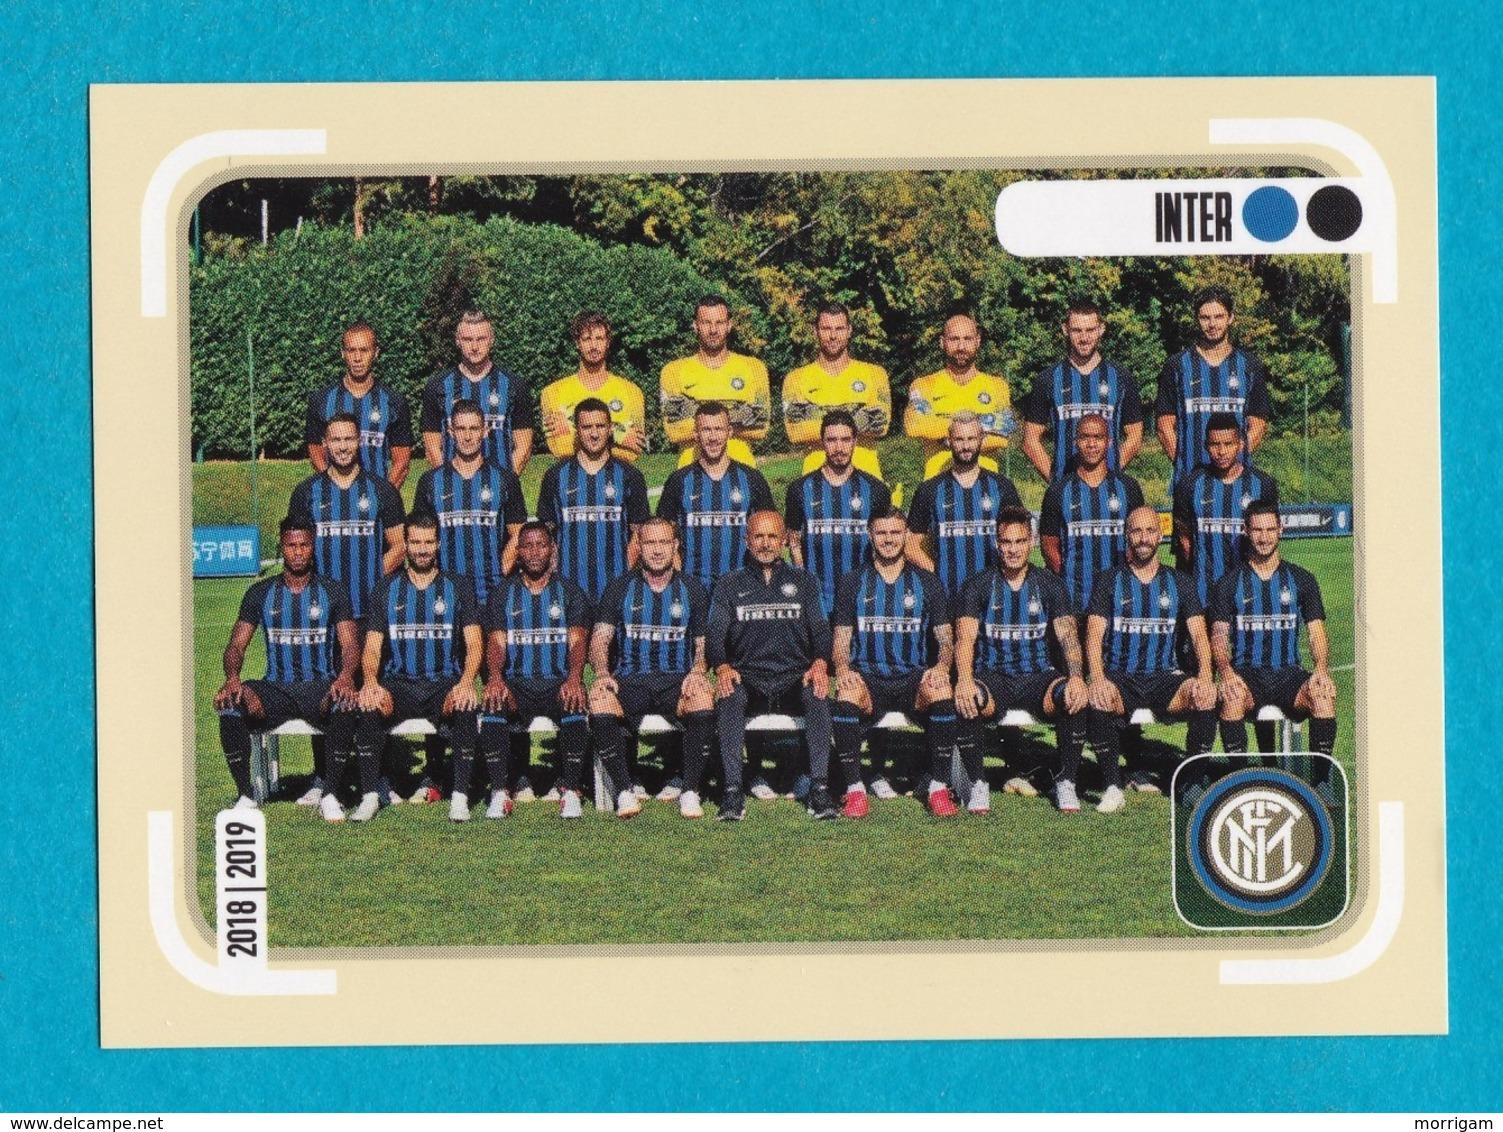 CALCIATORI Panini 2018 2019 - 252  Inter  Squadra - Panini